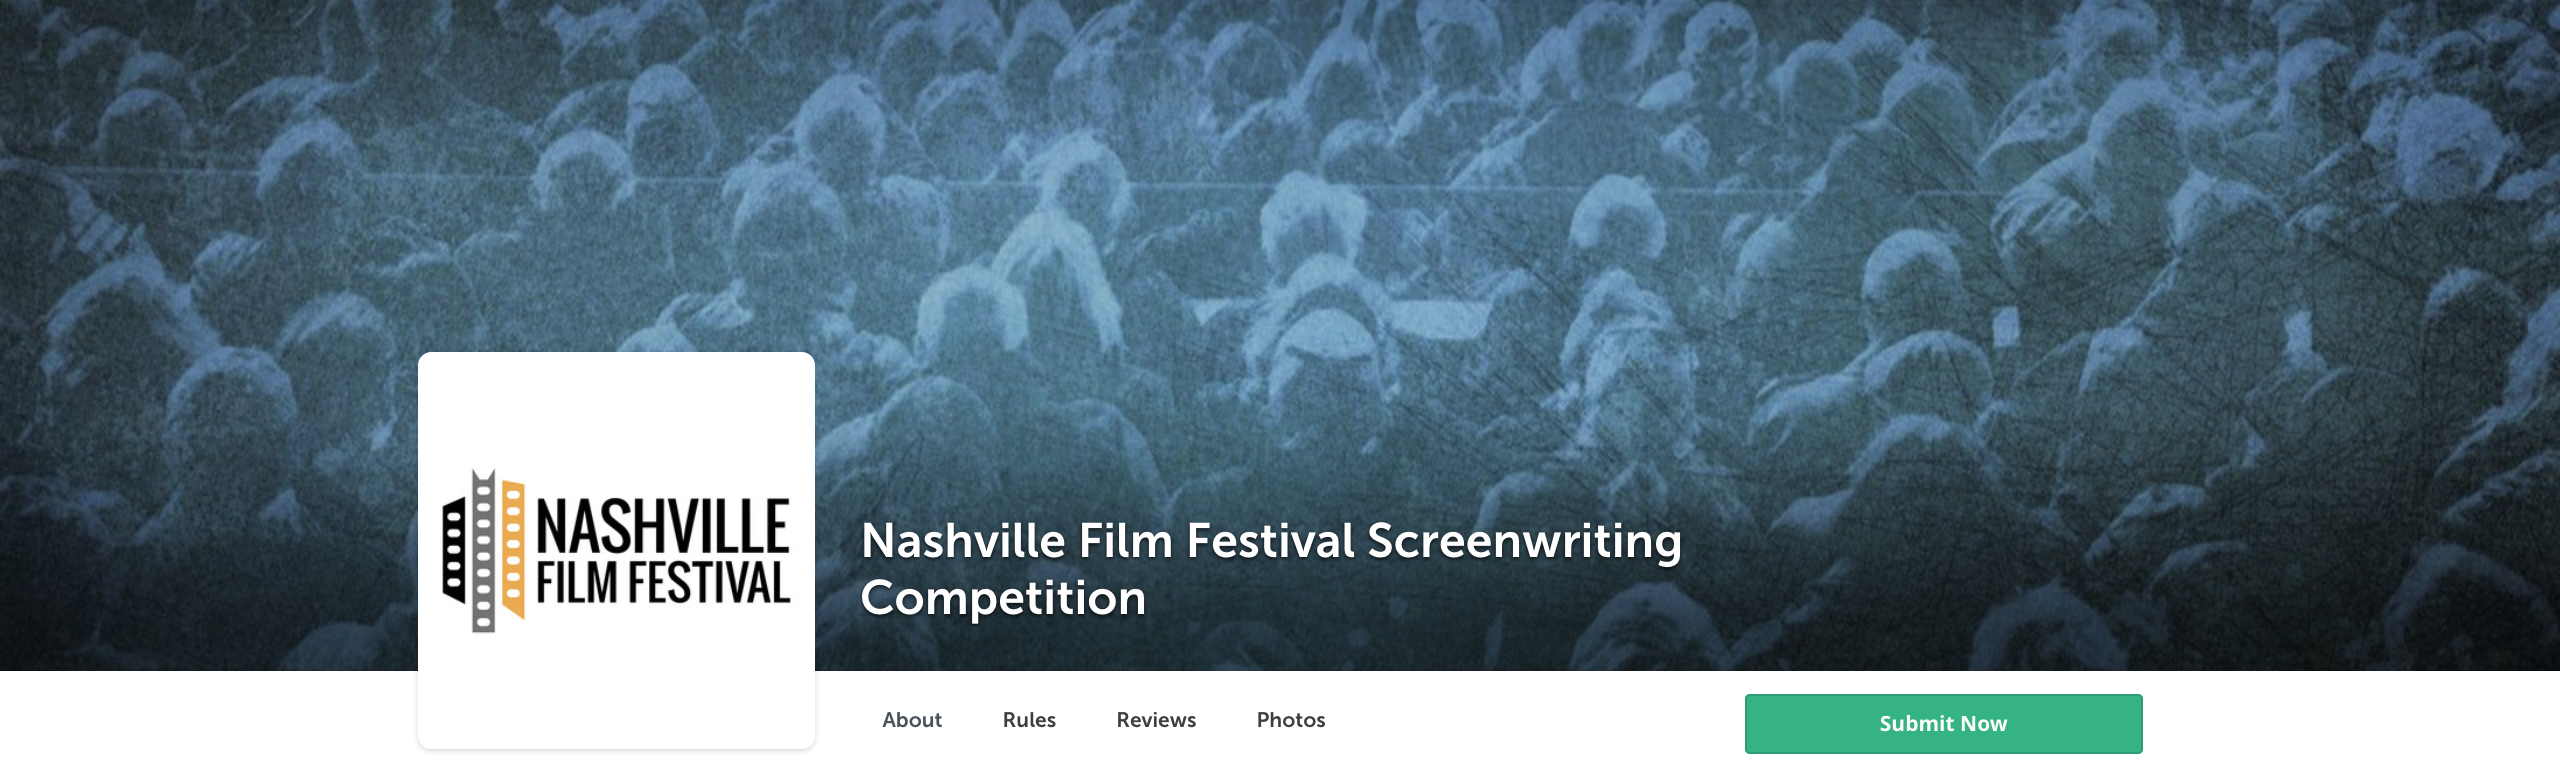 Nashville Film Festival Screenwriting Competition